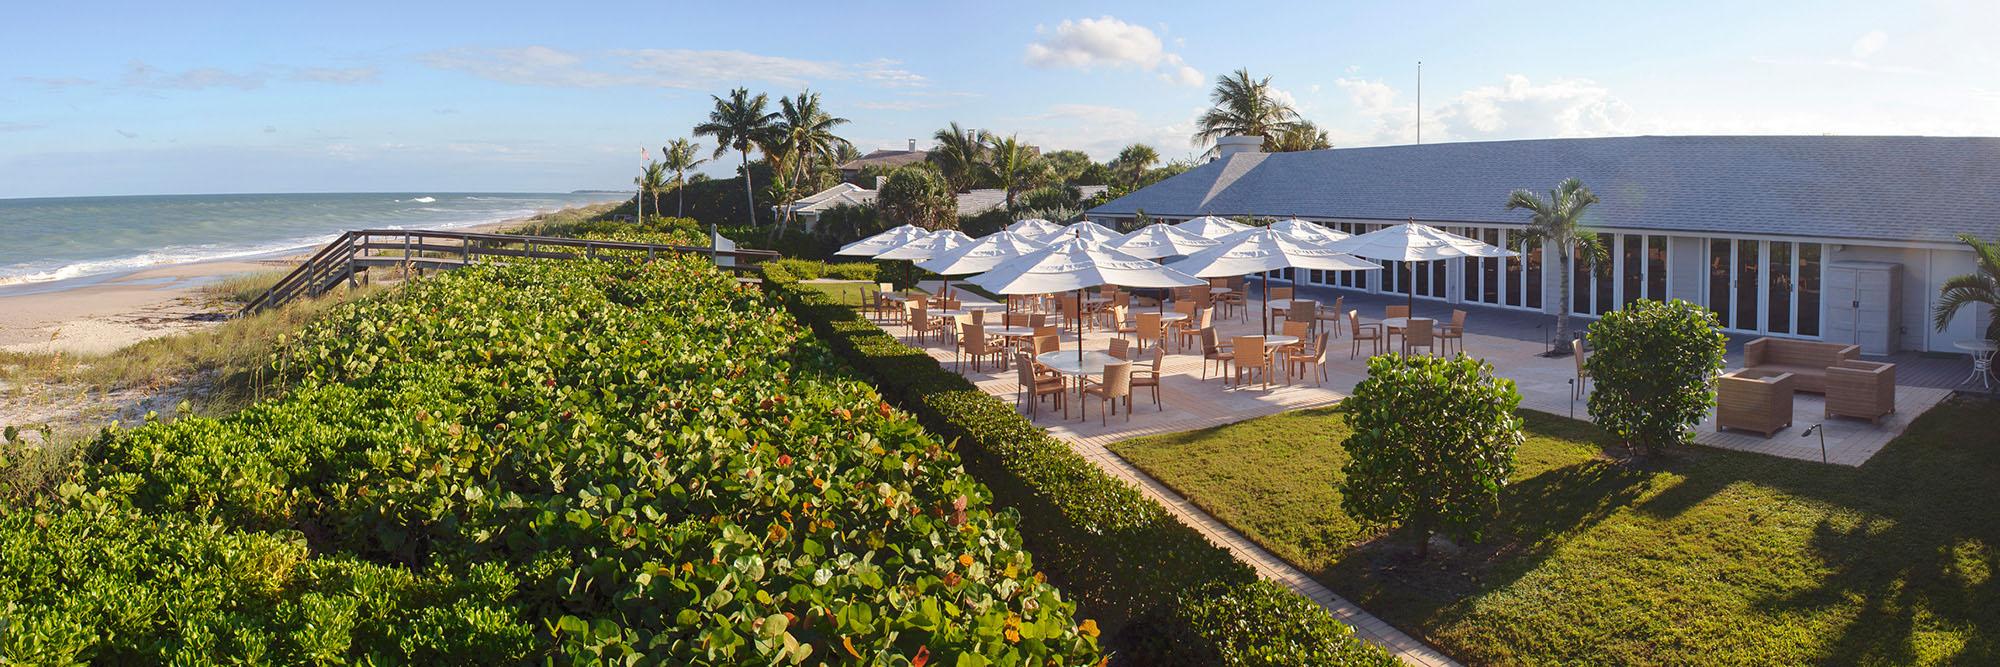 Golf Course Image - Riomar Beach Clubhouse